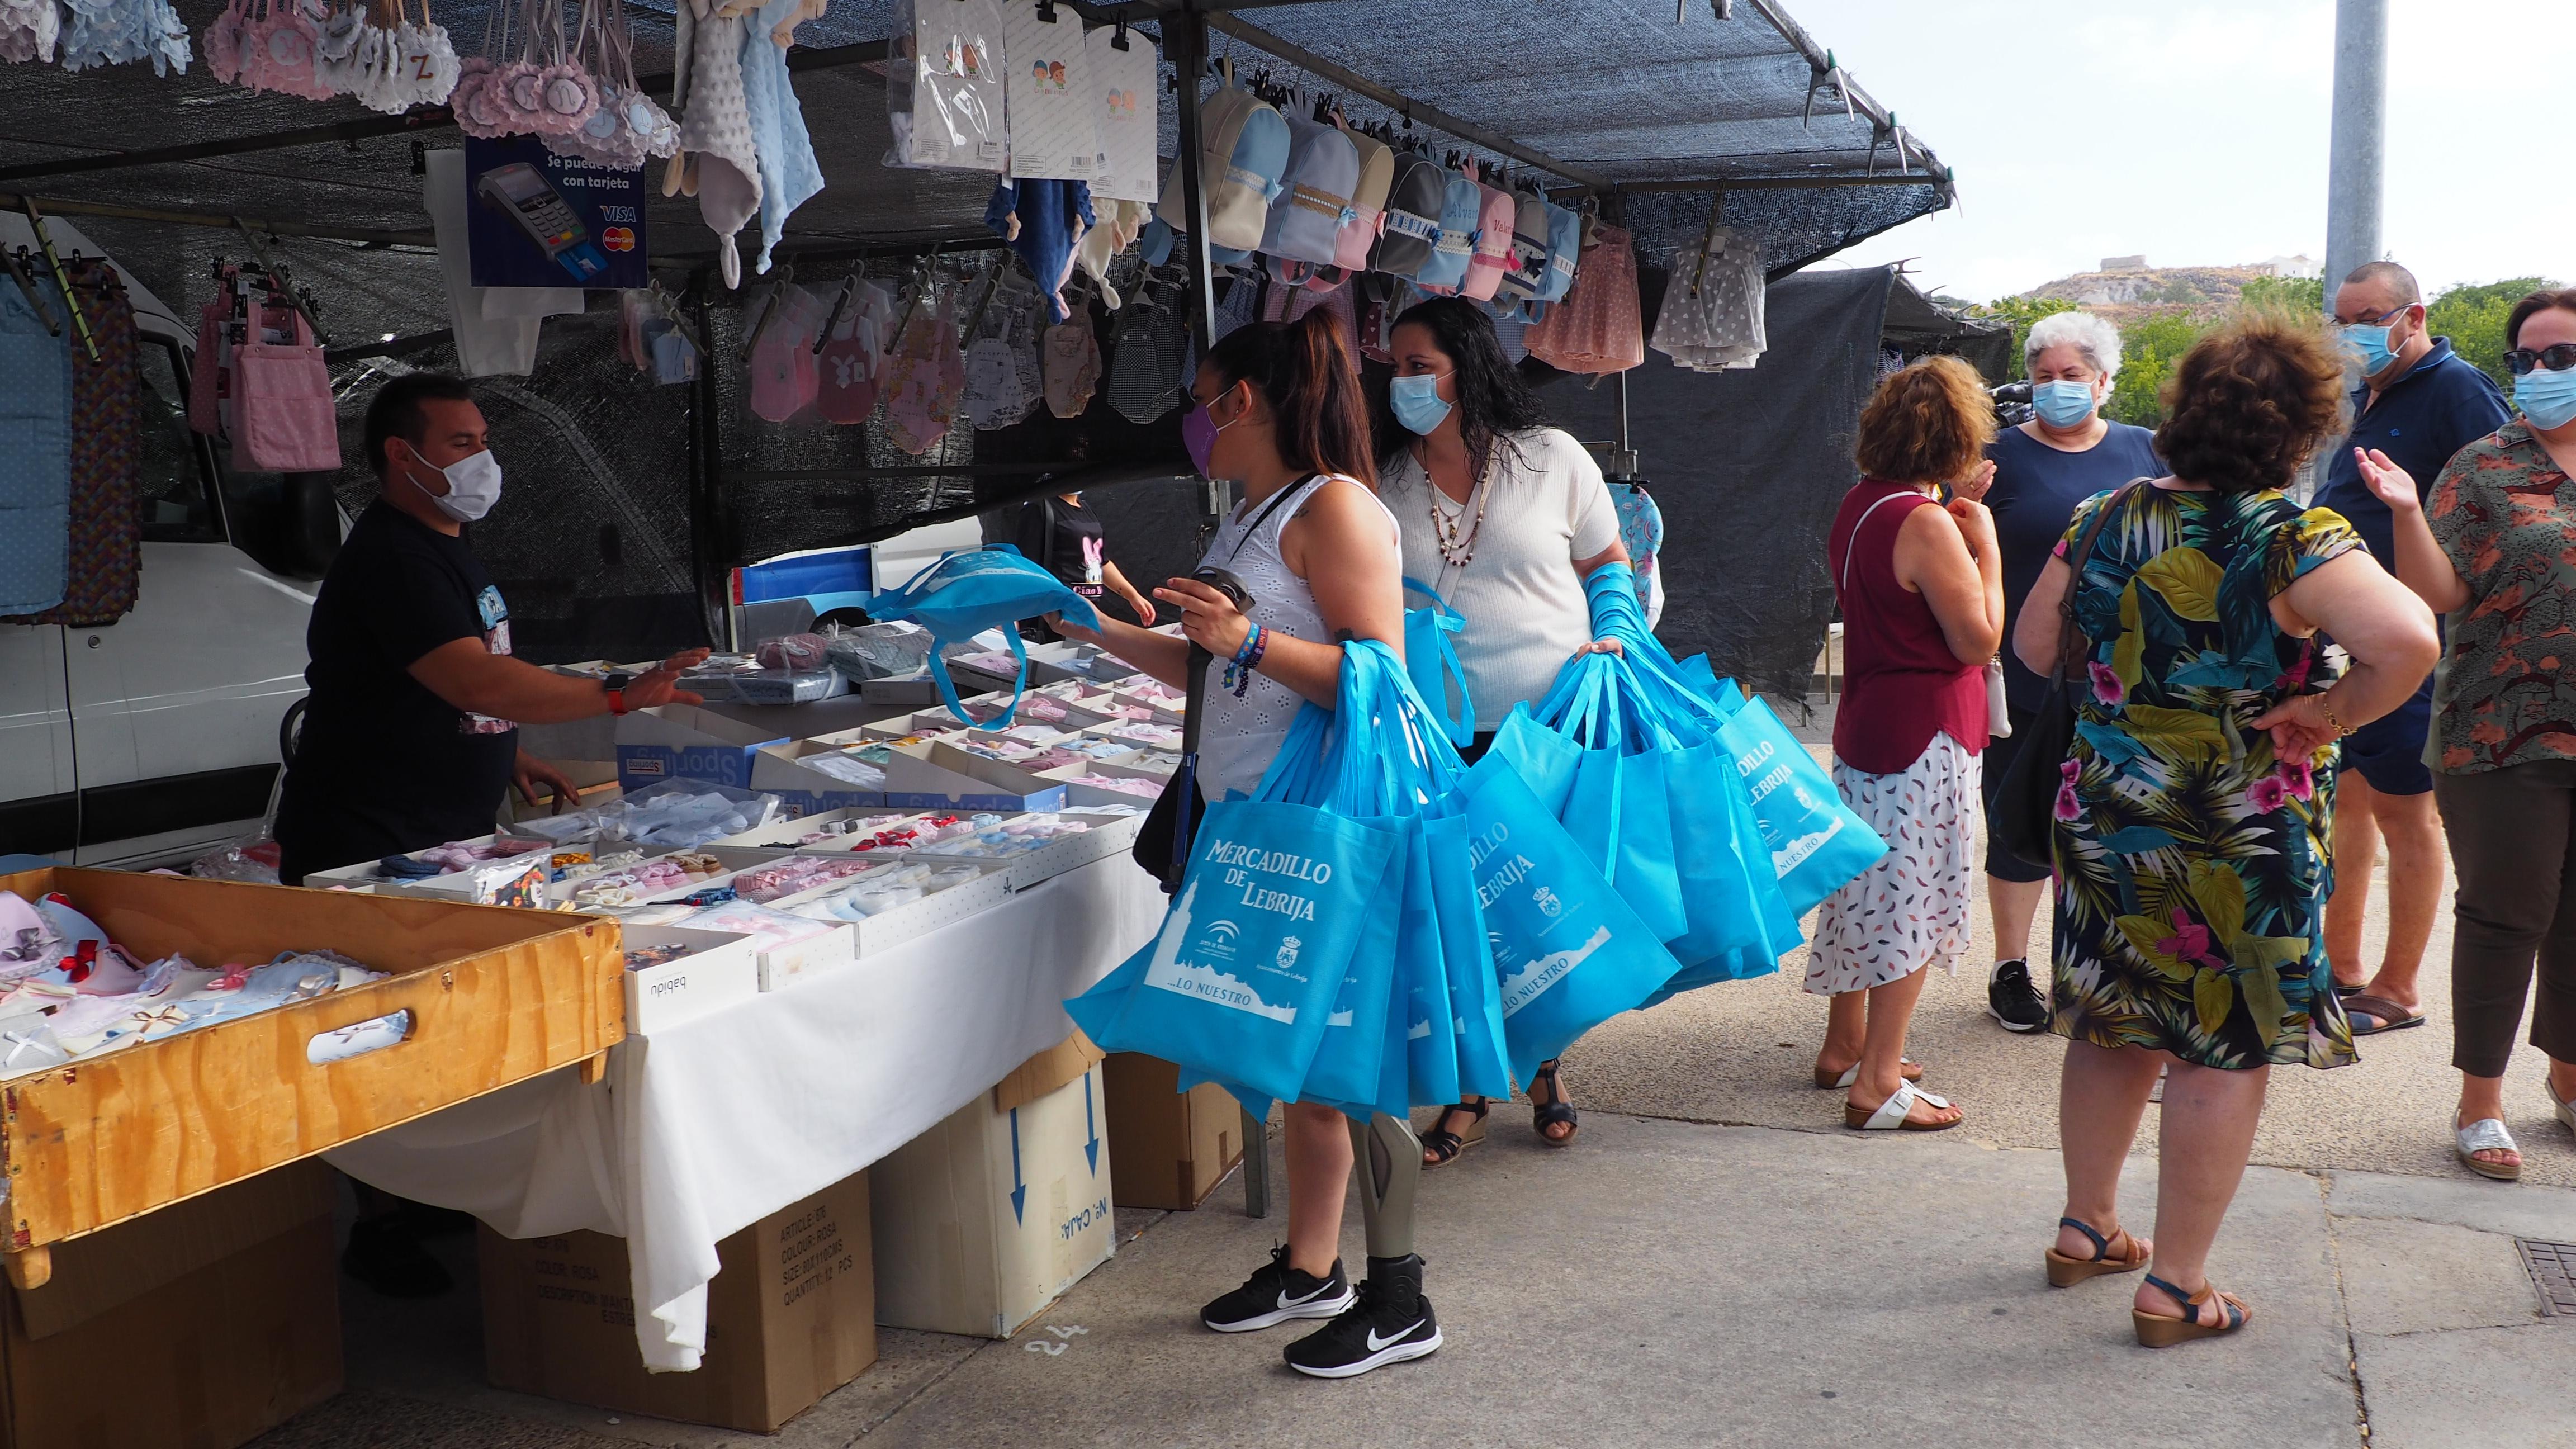 Reparto bolsas reutilizables Mercadillo Huerta Macenas (2)